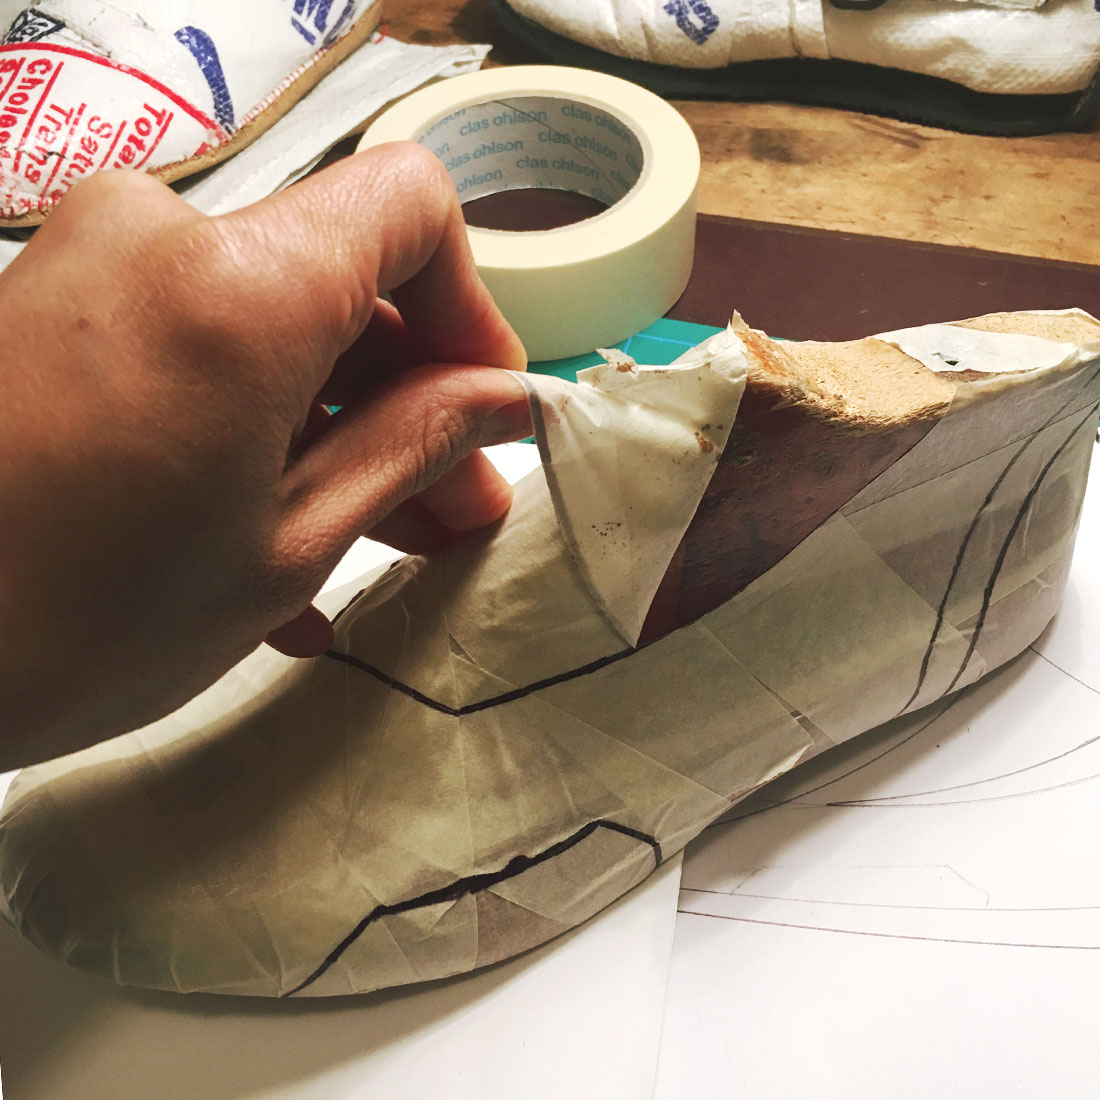 Buhay-developing-sustainabal_Shoes_005_2019.jpg